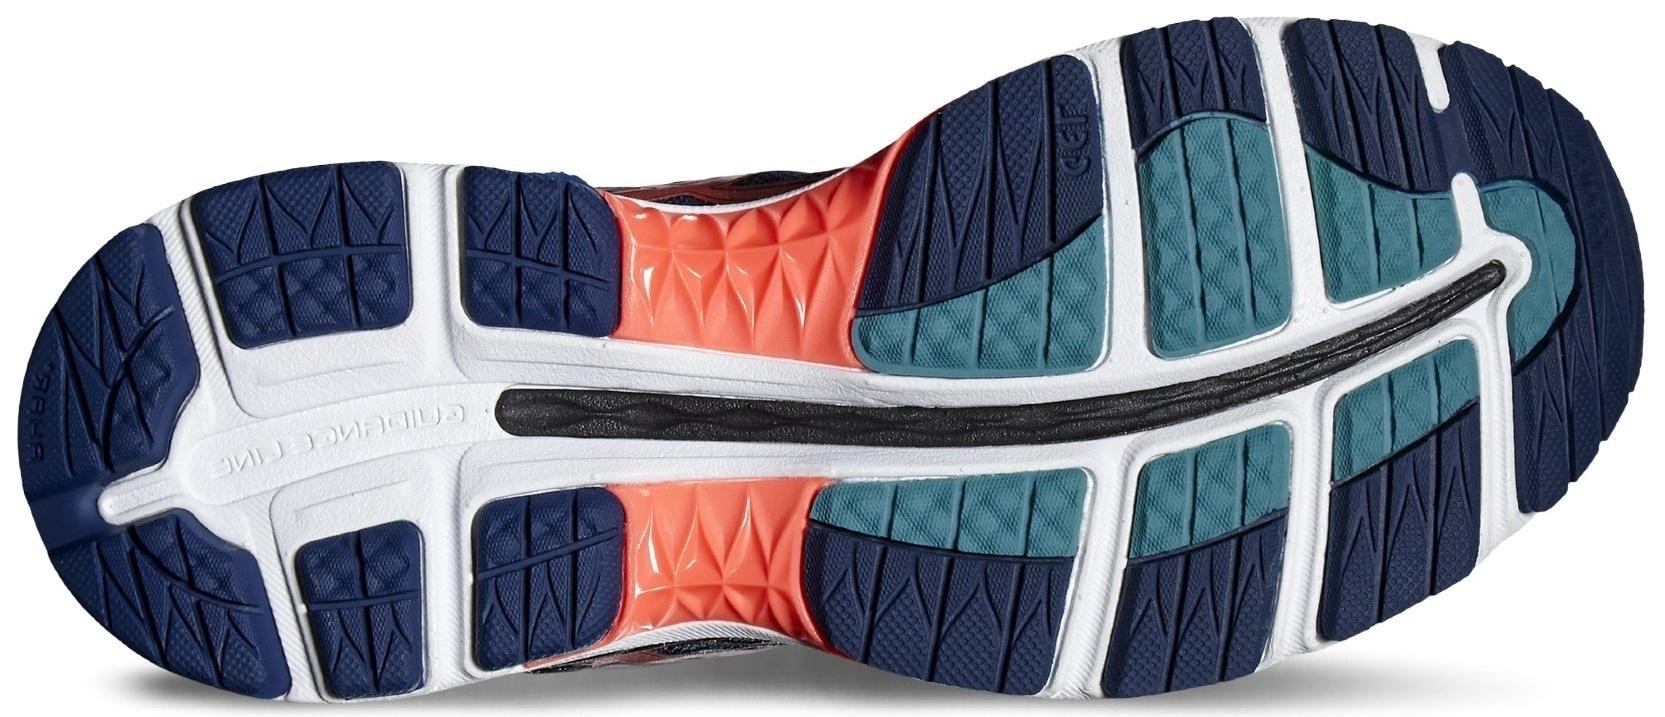 Женские кроссовки для бега Asics Gel-Nimbus 18 T650N 5806 синие фото